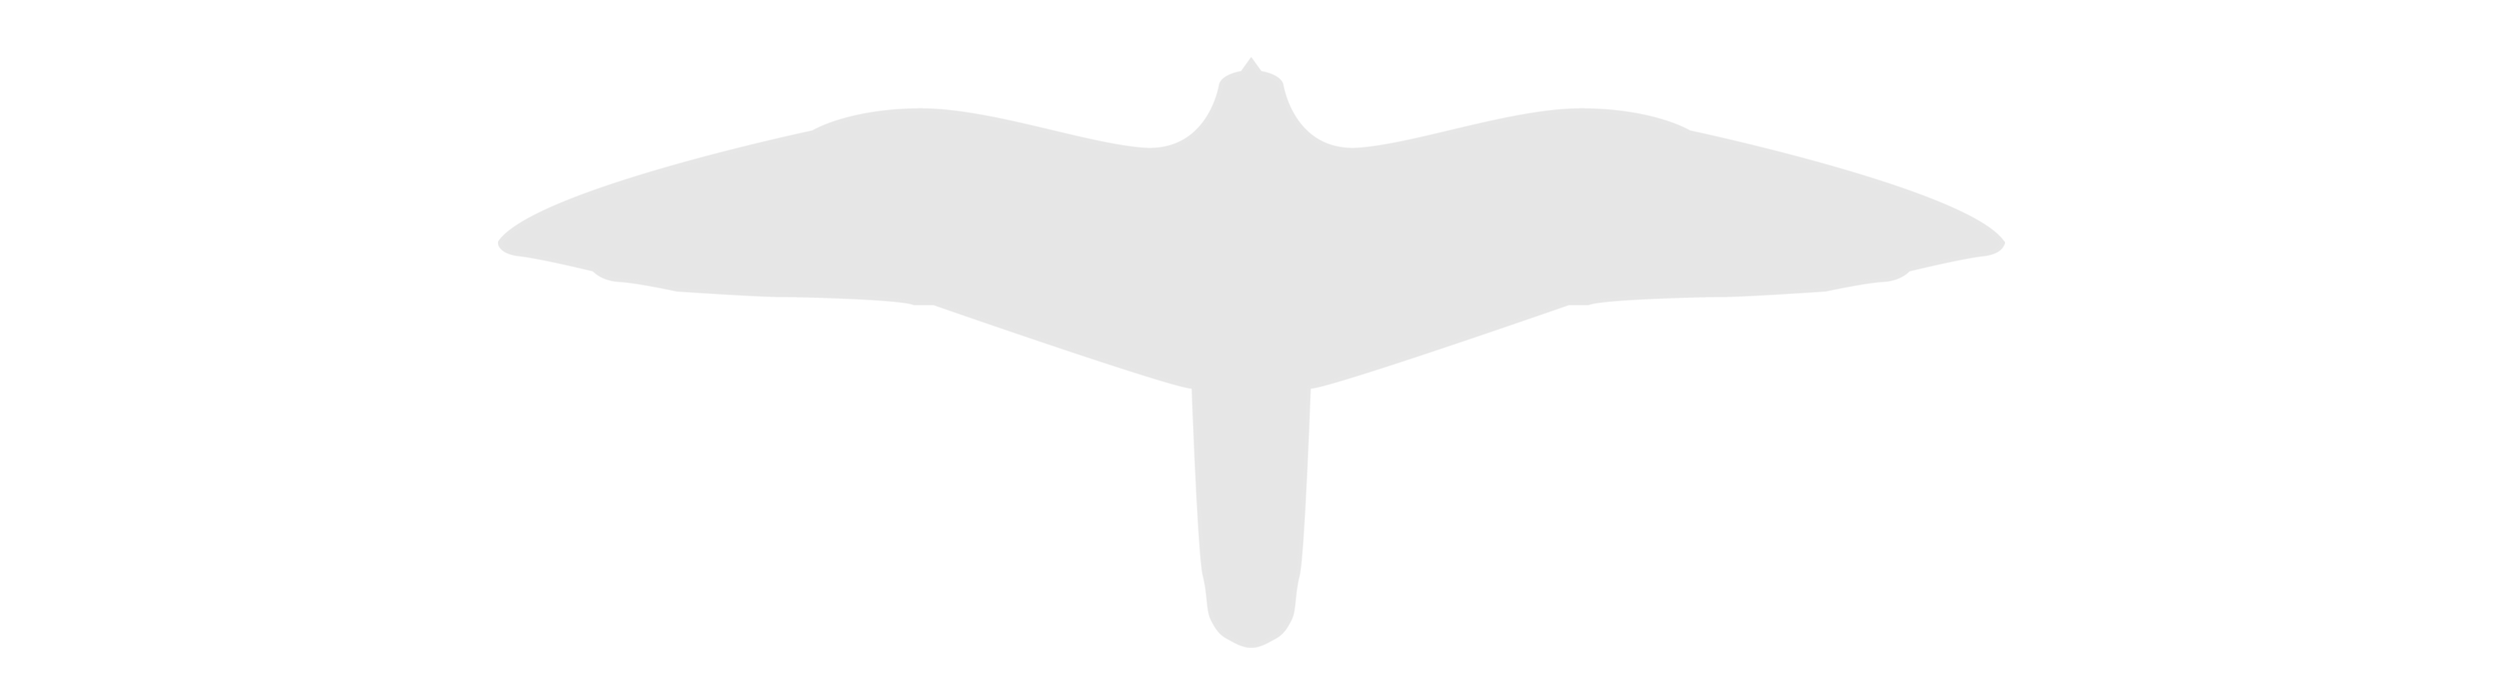 brendaperegrine.com logo (1).png